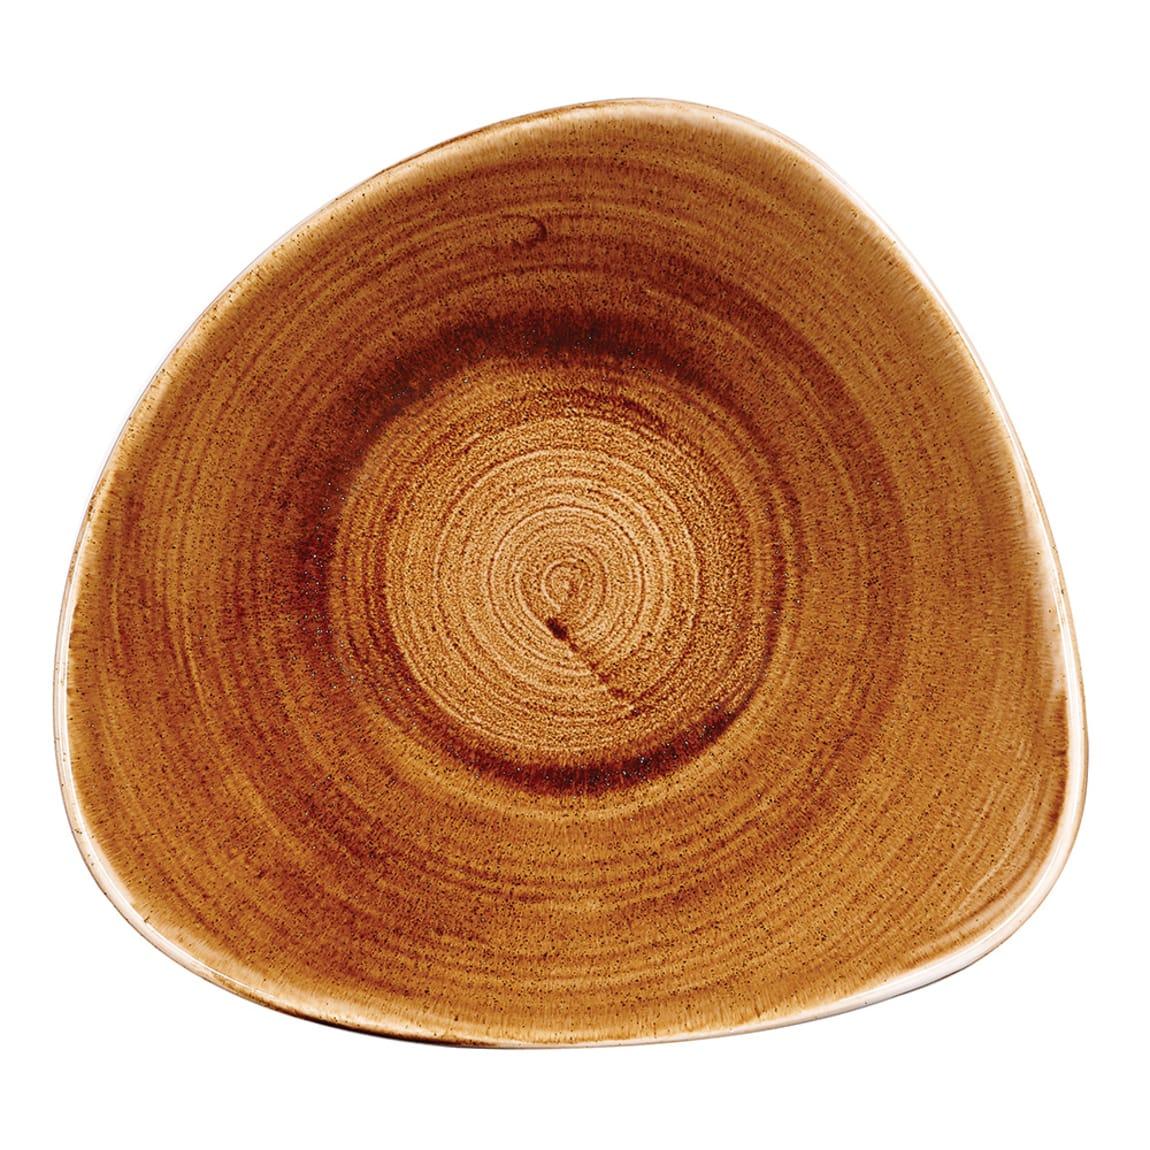 Churchill PAVCTRB91 21 oz Triangular Patina Bowl - Ceramic, Vintage Copper